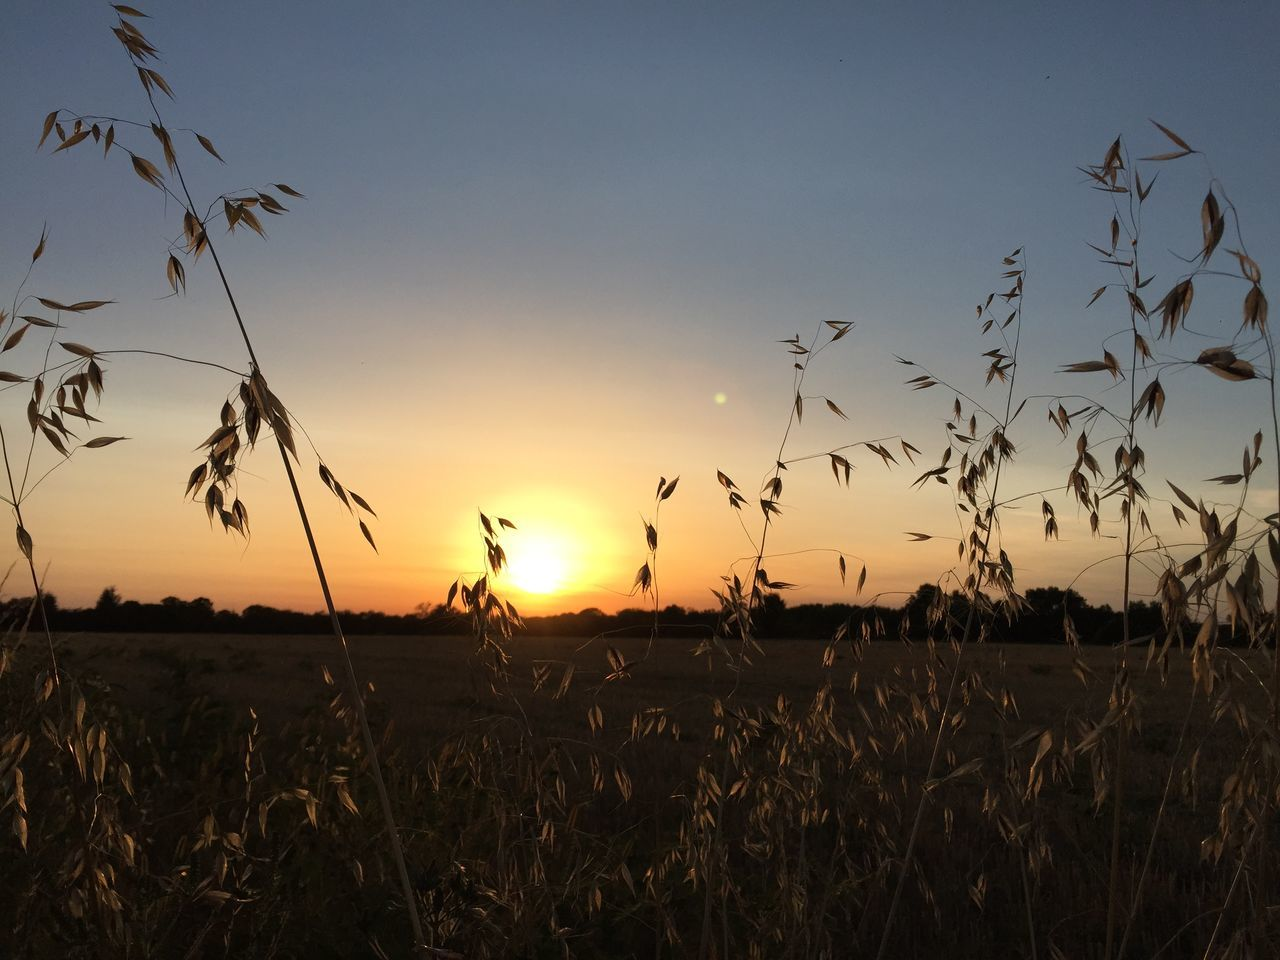 Crop Field Against Sunset Sky